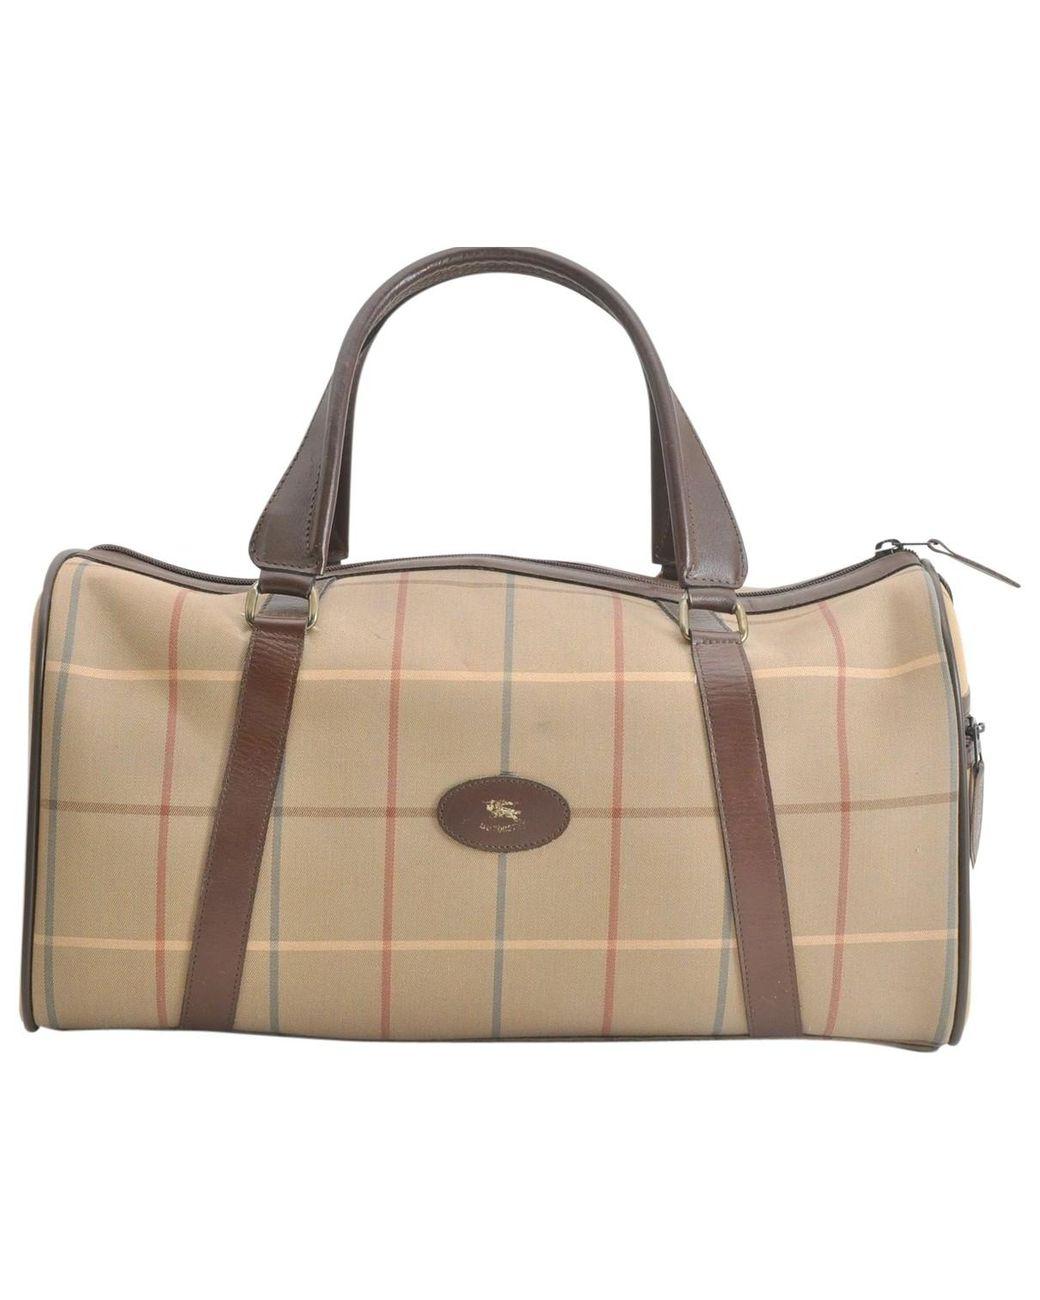 968e26911b7a Lyst - Burberry Vintage Beige Cloth Handbag in Natural